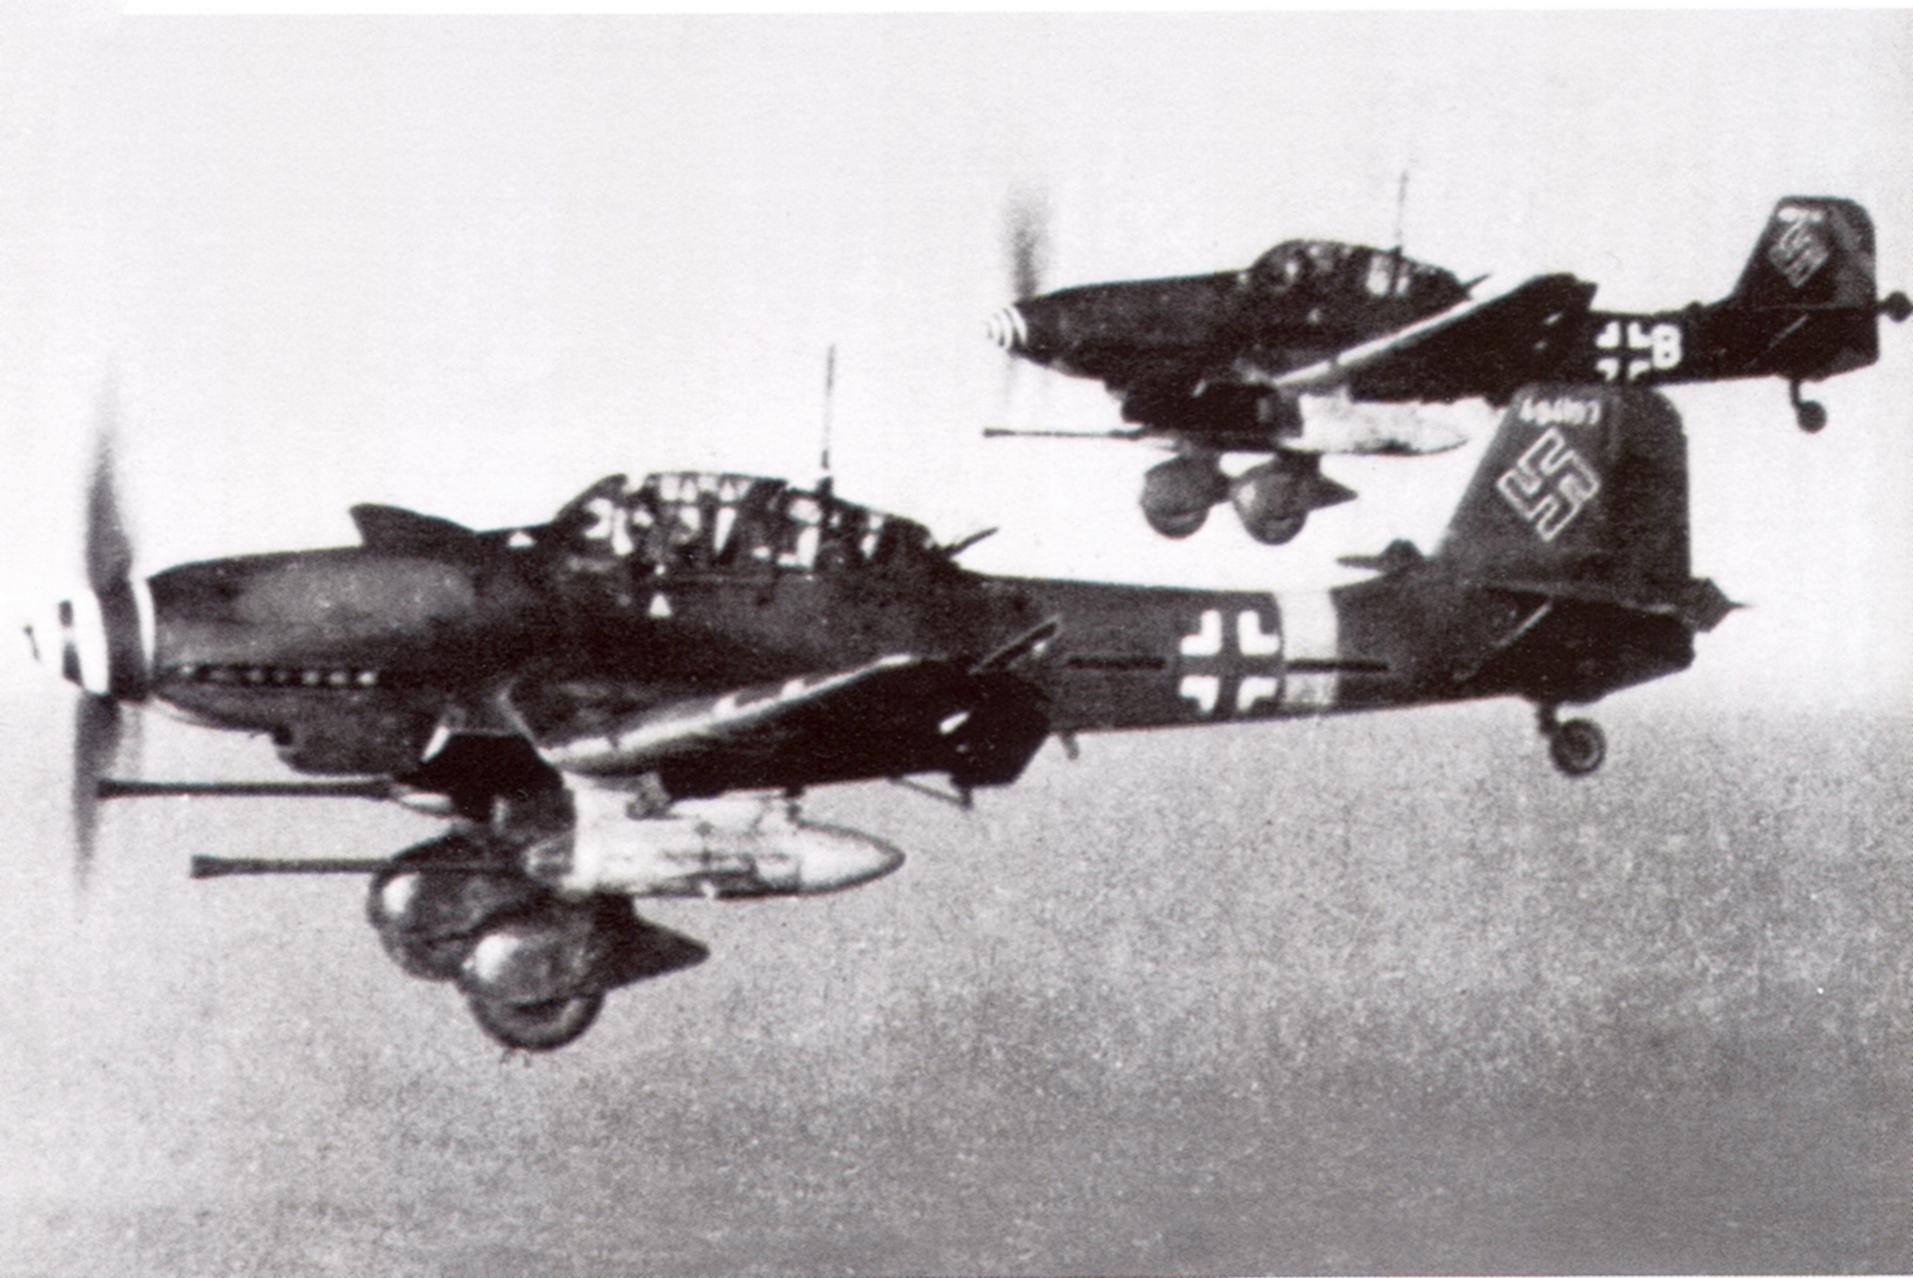 Junkers Ju 87G2 Stuka Stab SG2 WNr 494193 Stkz SO+FW Rudel over Seregelyes Hungary Dec 1944 01